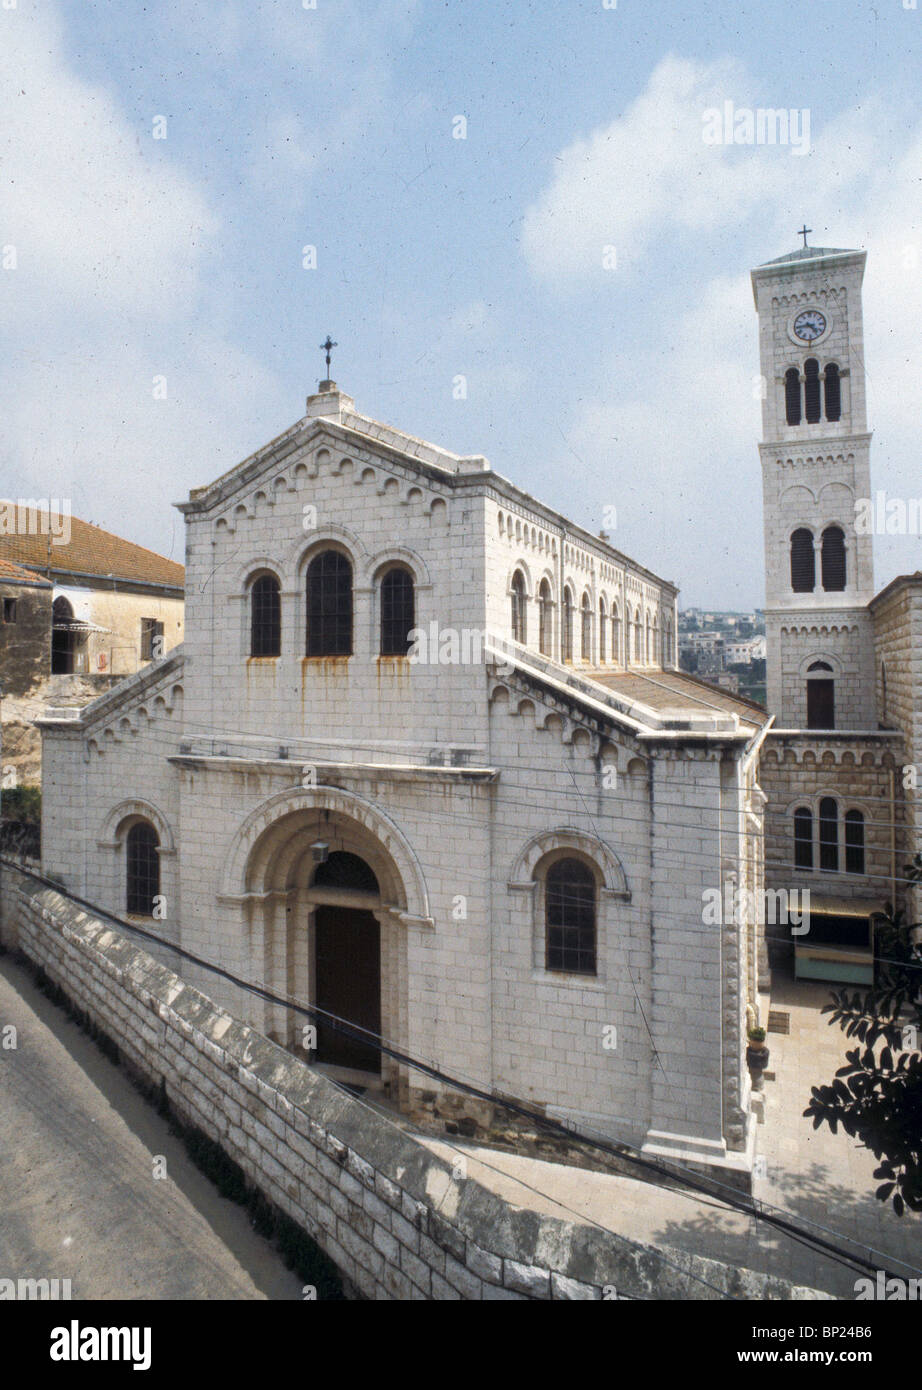 482. NAZARETH, CHURCH OF ST. JOSEPH - Stock Image